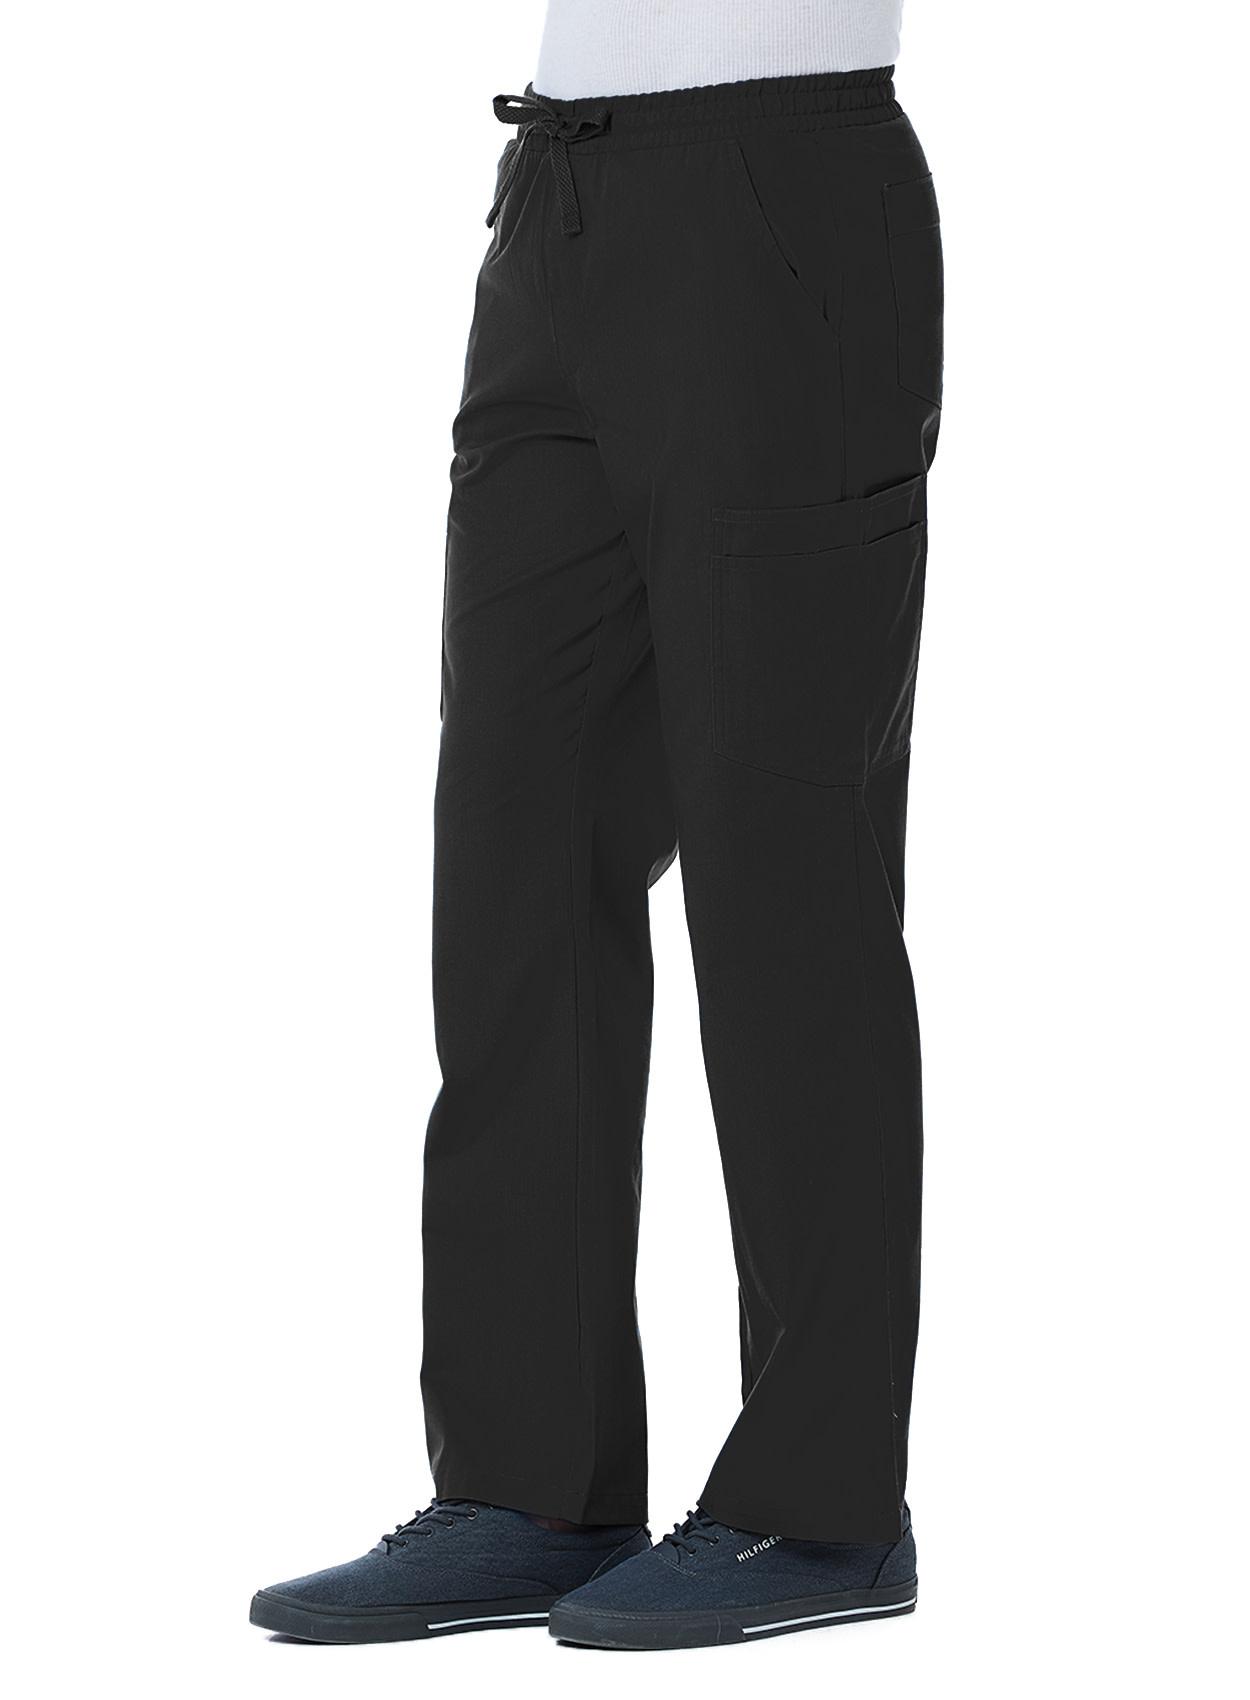 RED PANDA Black Men's Cargo Pants 8206T